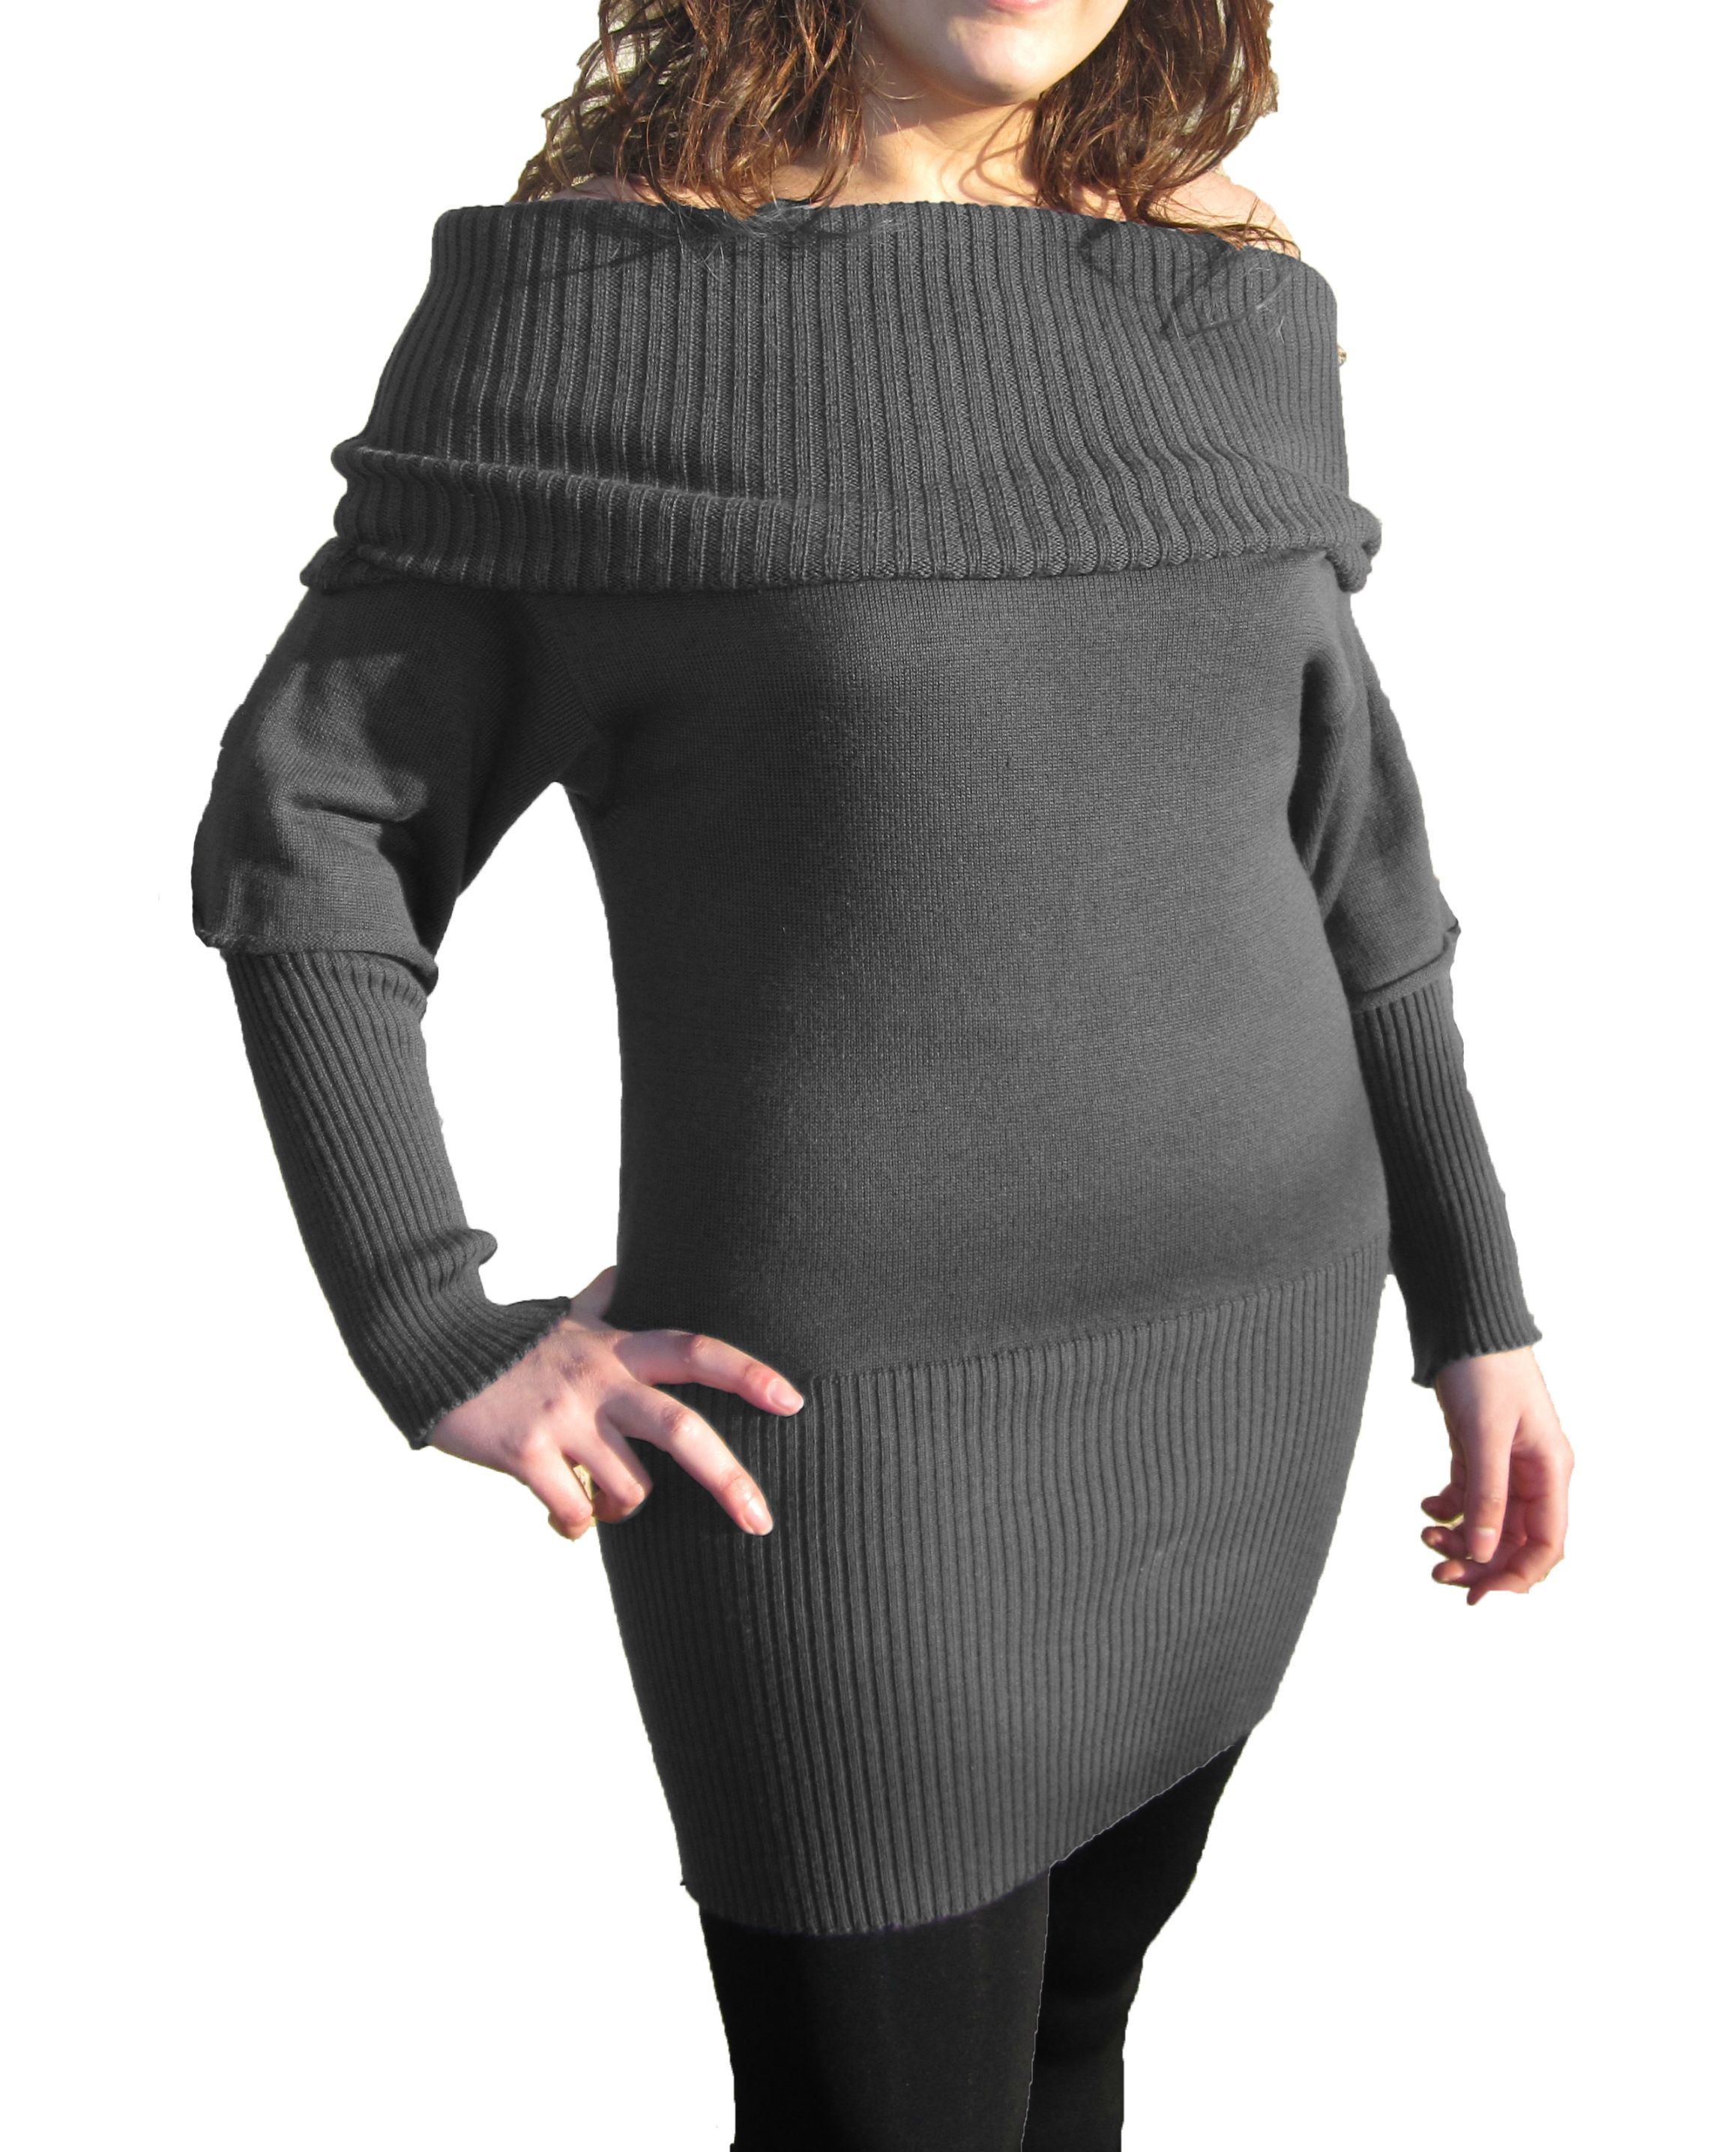 Knitwear Short Dress with Boat Neck - Grey